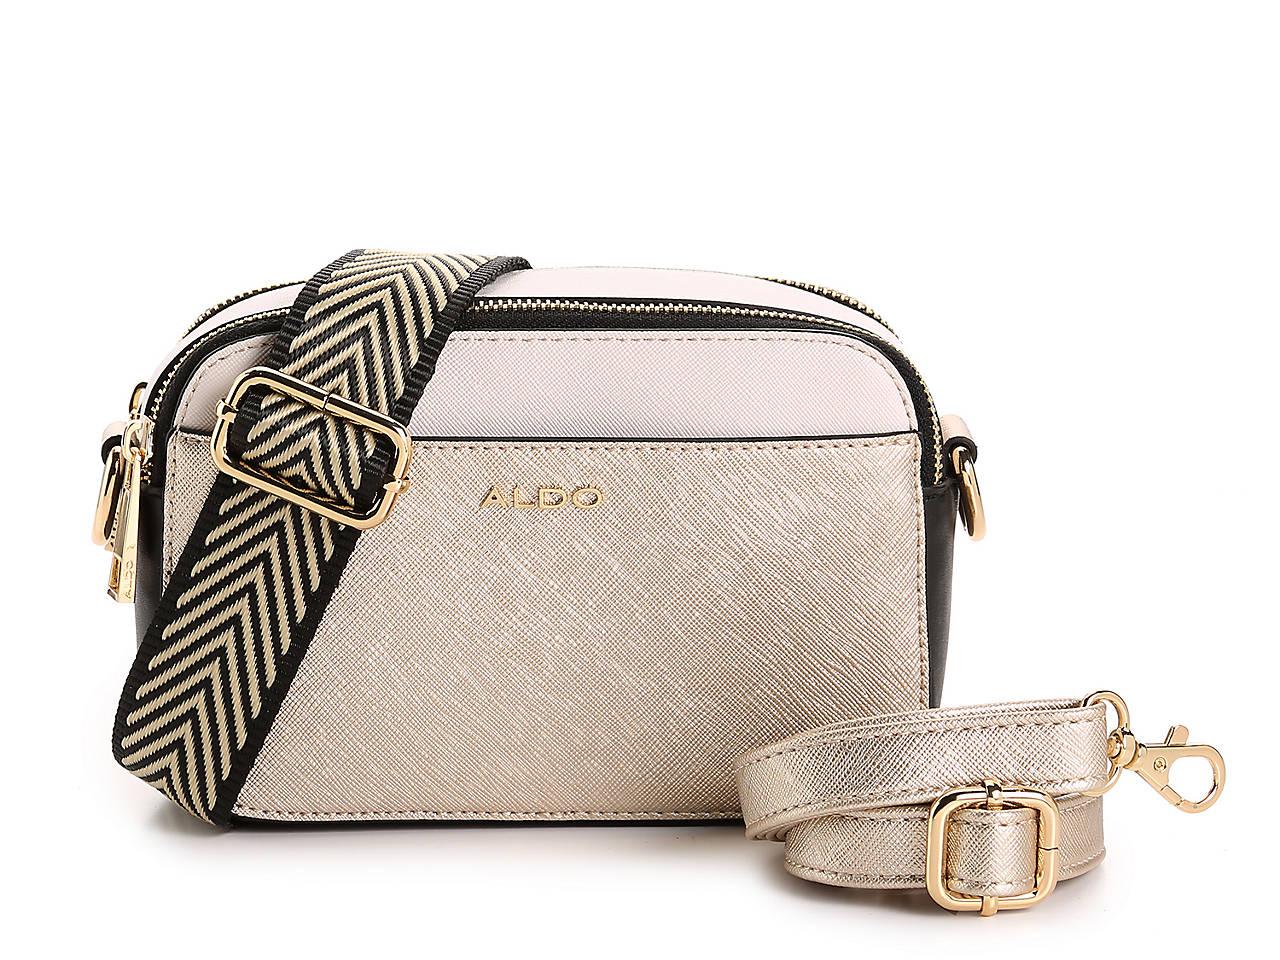 4c3863a74 Aldo Ridout Crossbody Bag Women's Handbags & Accessories | DSW